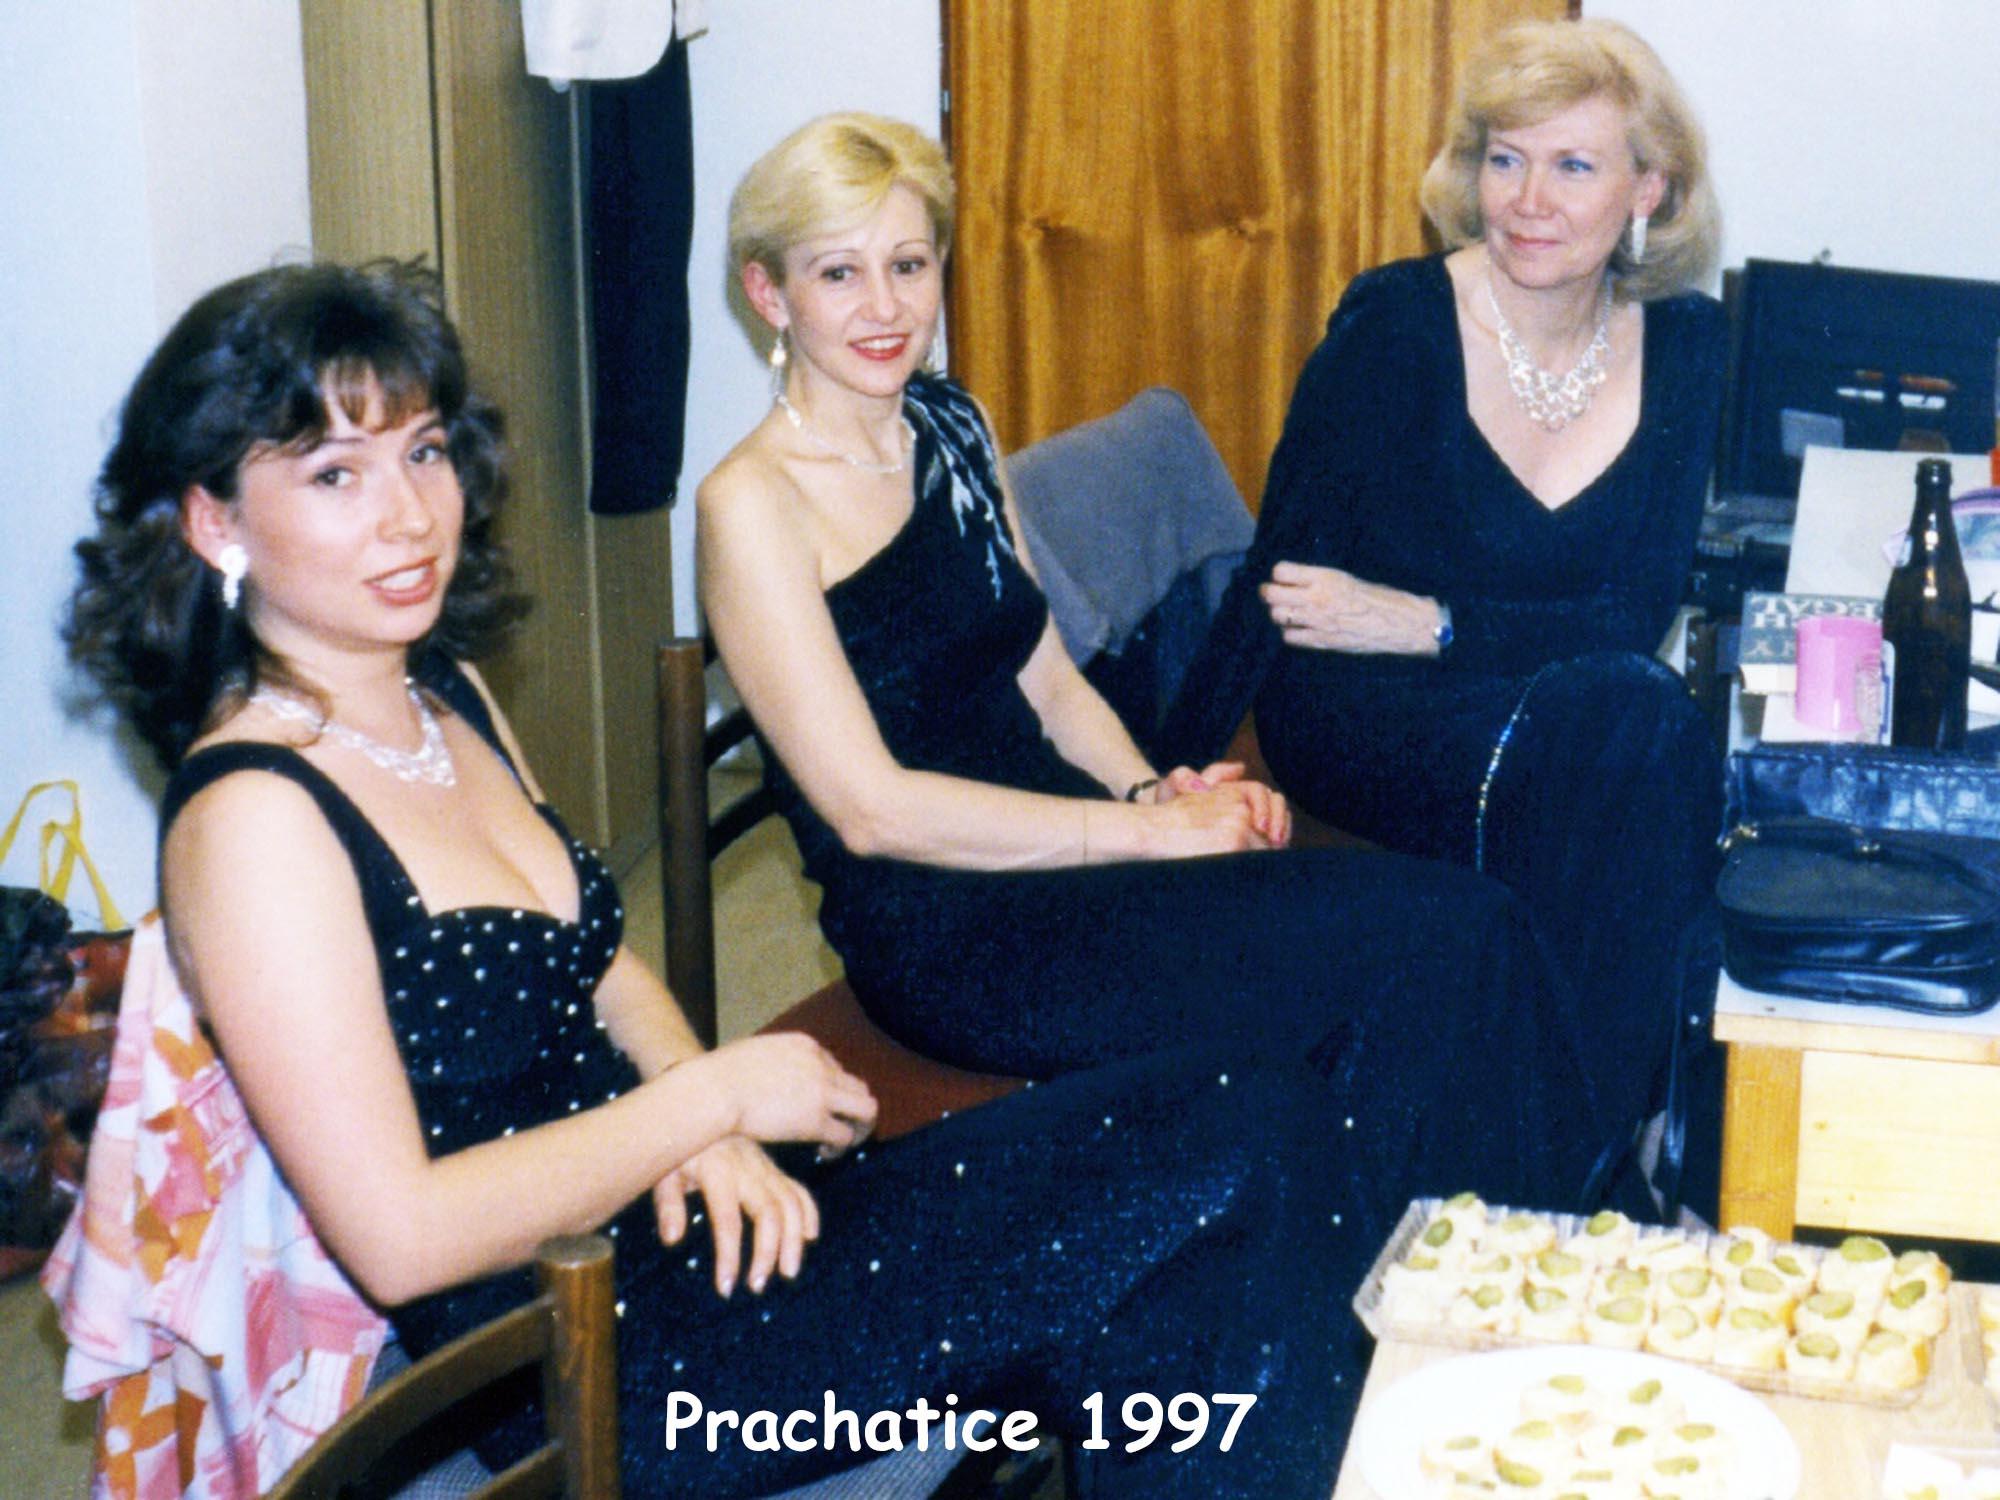 PRACH-1997-01-WEB